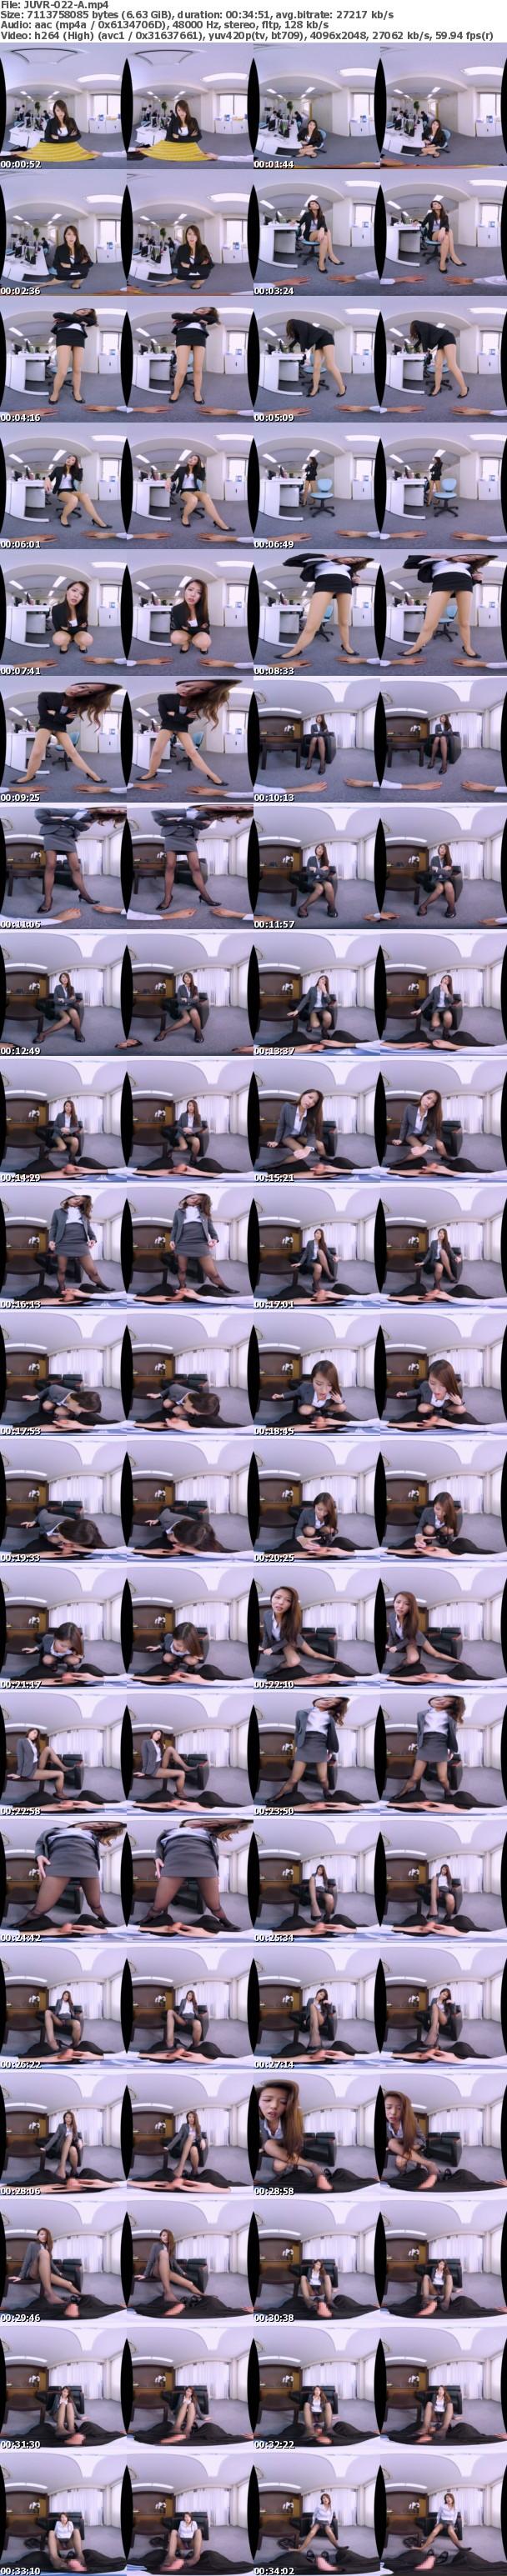 (VR) JUVR-022 【M男専用】初仕事でミスをして女上司に平謝りする新人の僕が思わず見上げるとまさかのエロハプニング!! 土下座視点VR!!全編パンスト着用!!/見下し淫語JOI/S痴女上司の逆レ○プ 通野未帆